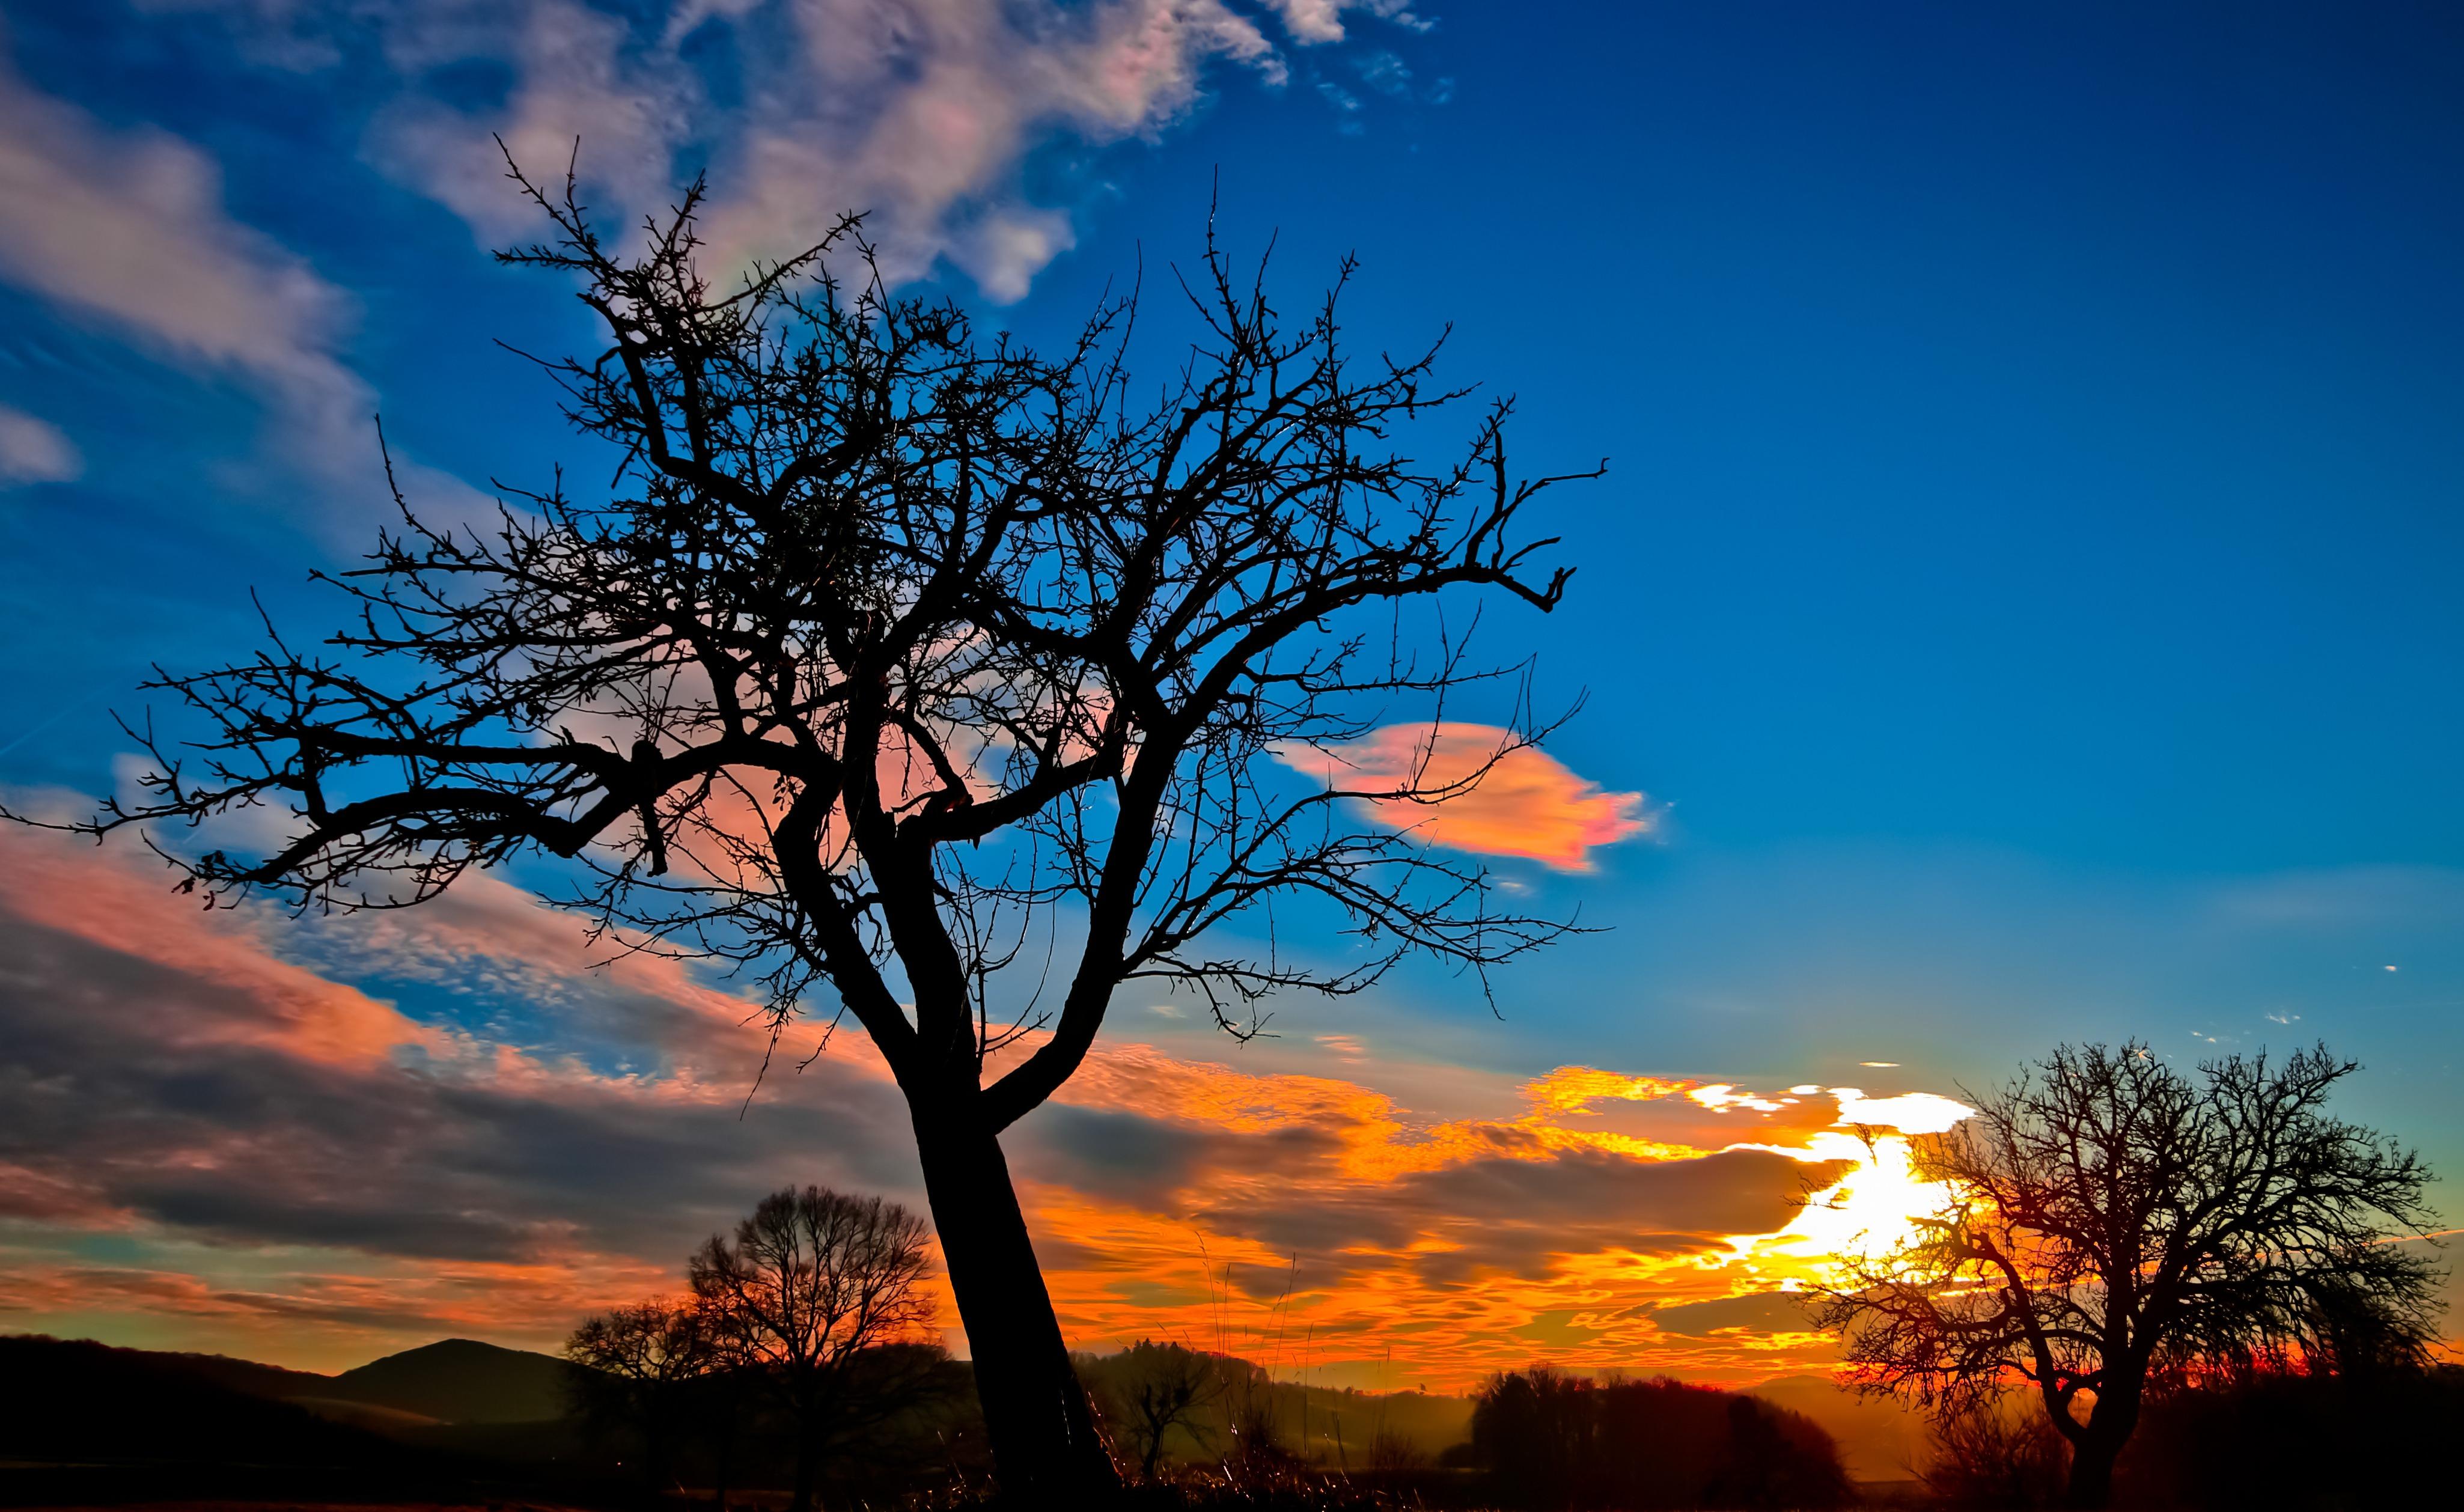 Free photo: Sky, Clouds, Sunset, Tree, Evening - Free Image on ...